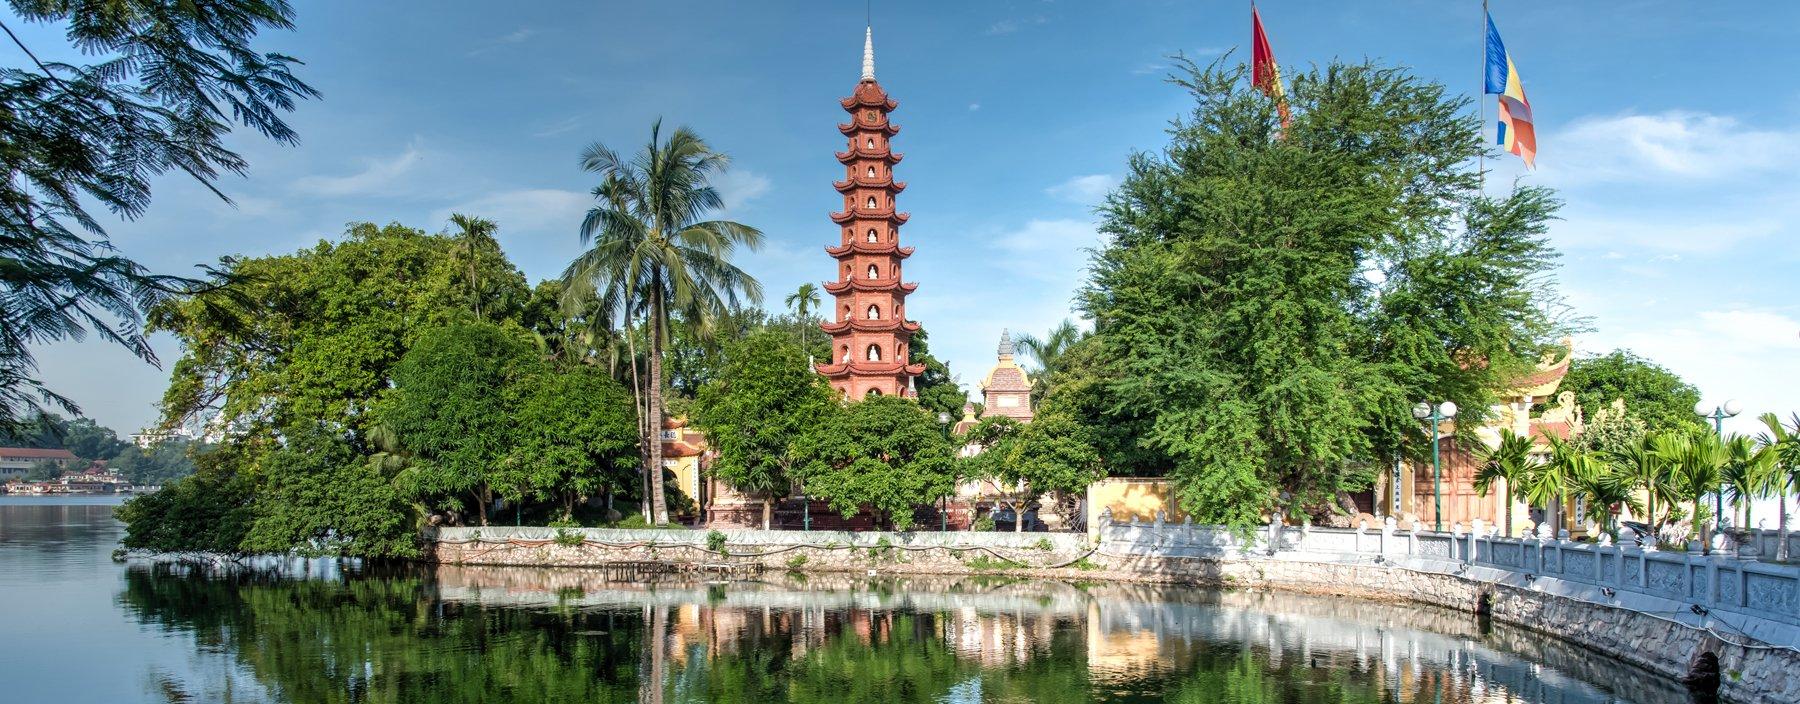 vn, hanoi, tran quoc pagoda (2).jpg